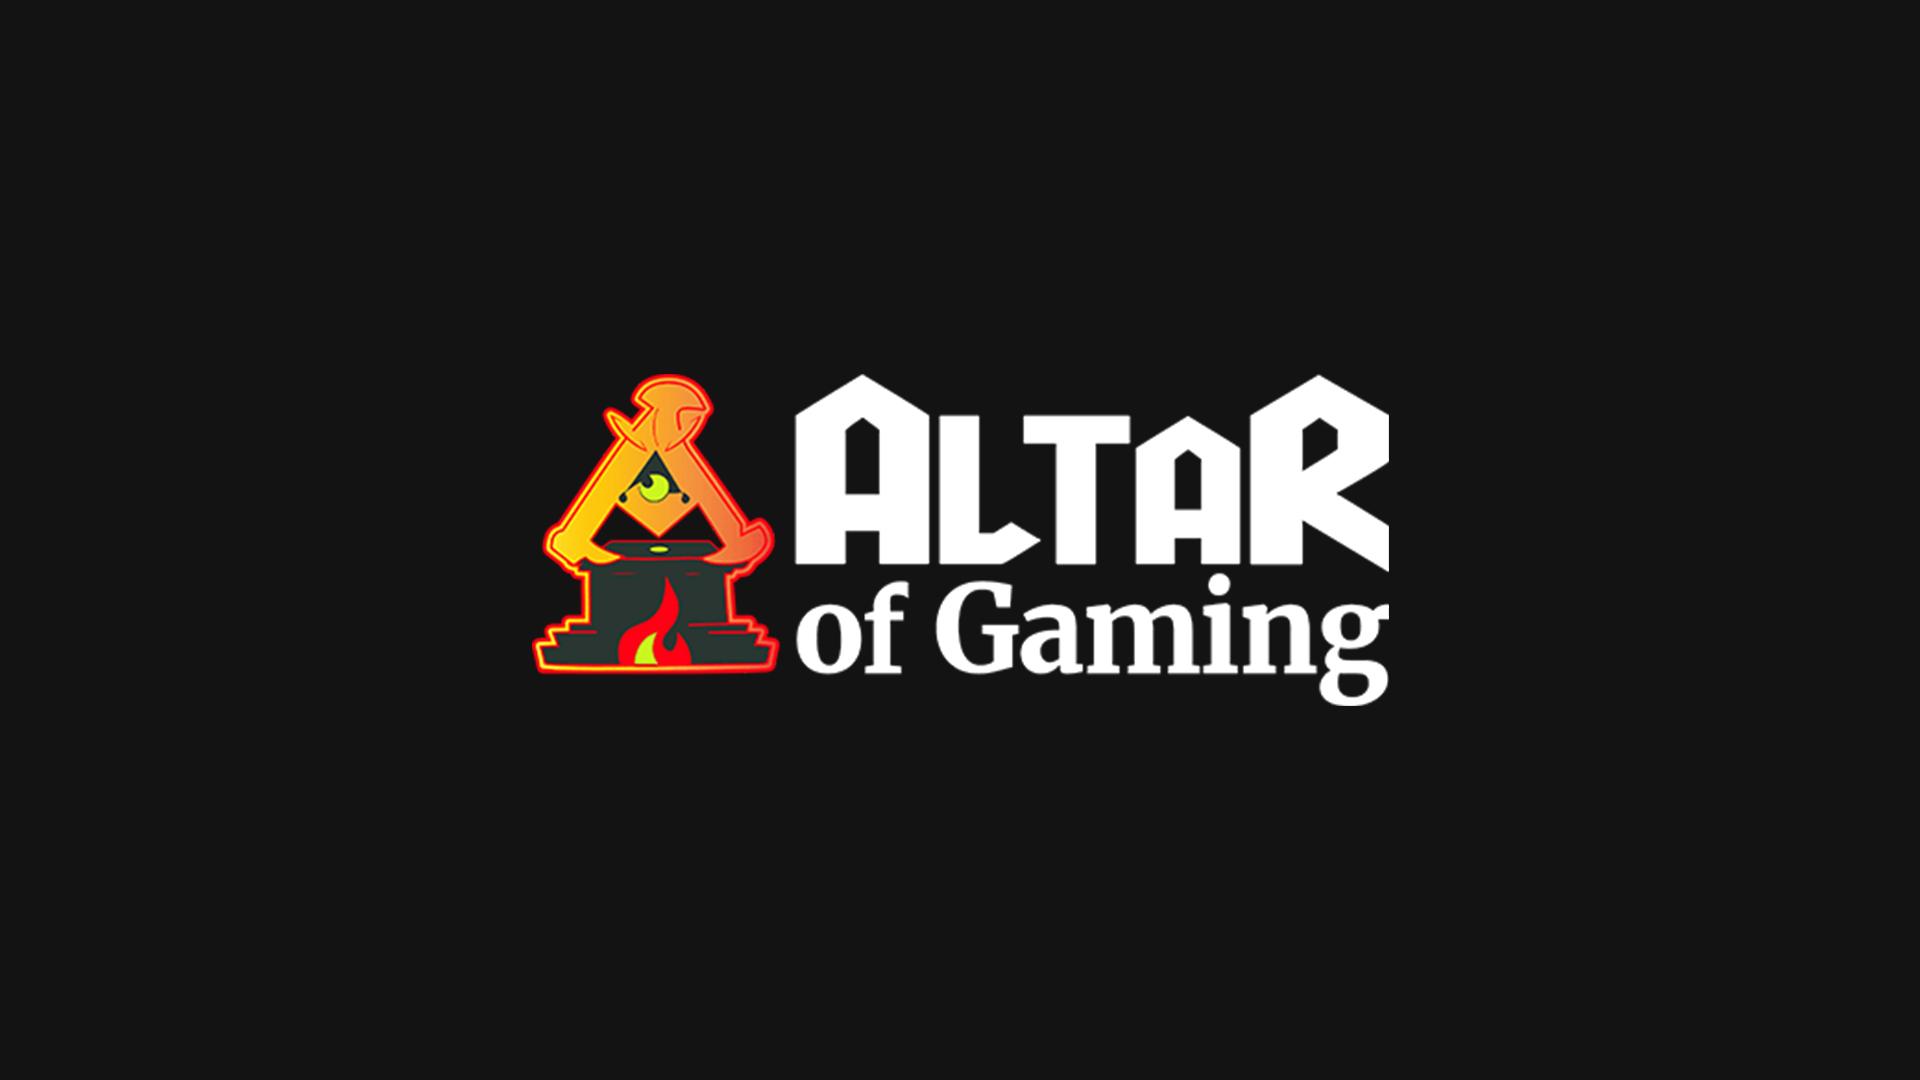 Altar-of-Gaming-logo